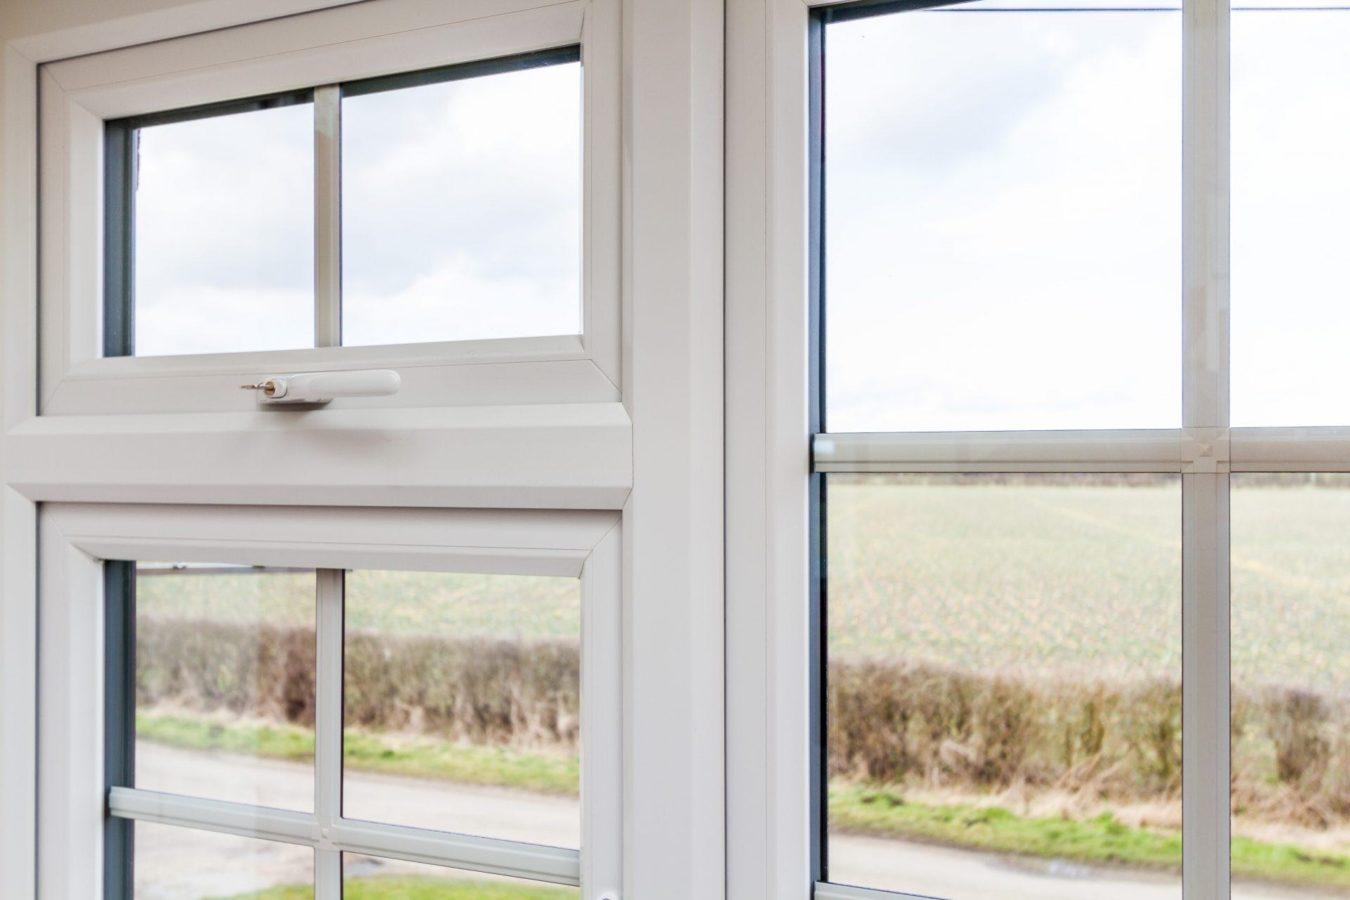 secondary glazing installers salisbury wiltshire